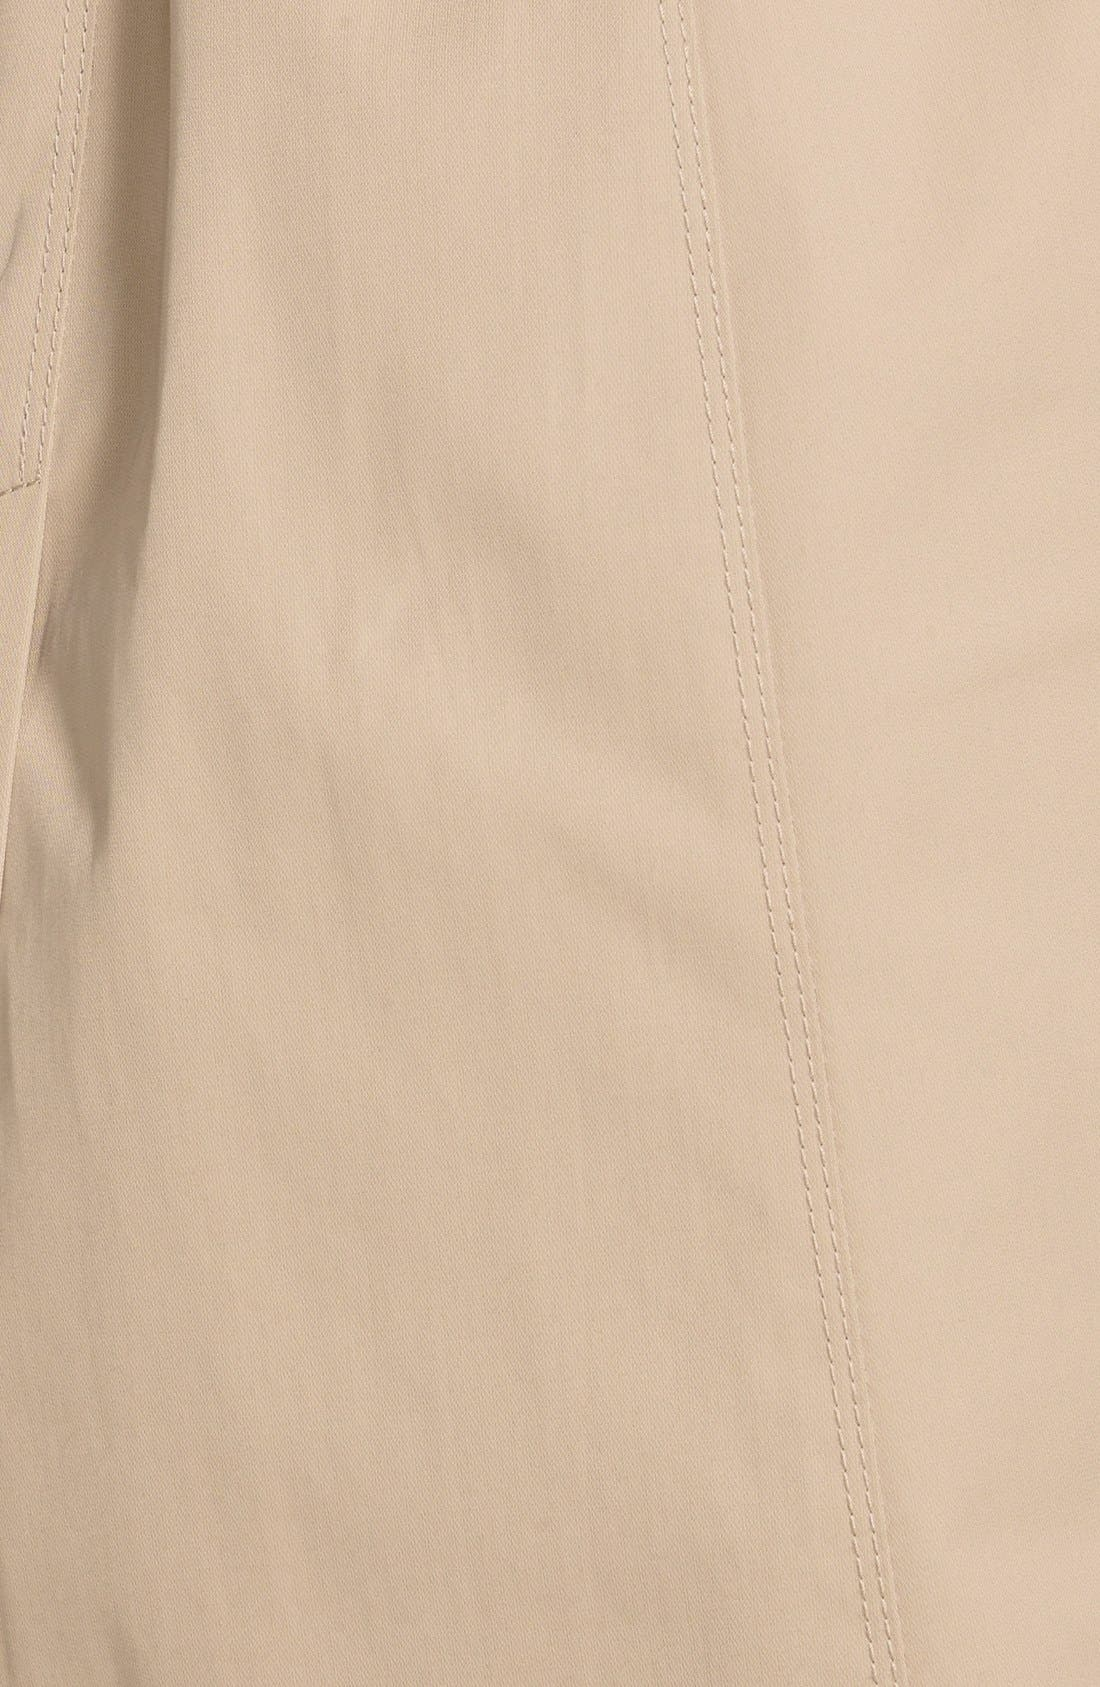 Alternate Image 3  - London Fog Heritage Trench Coat with Detachable Liner (Regular & Petite) (Nordstrom Exclusive)